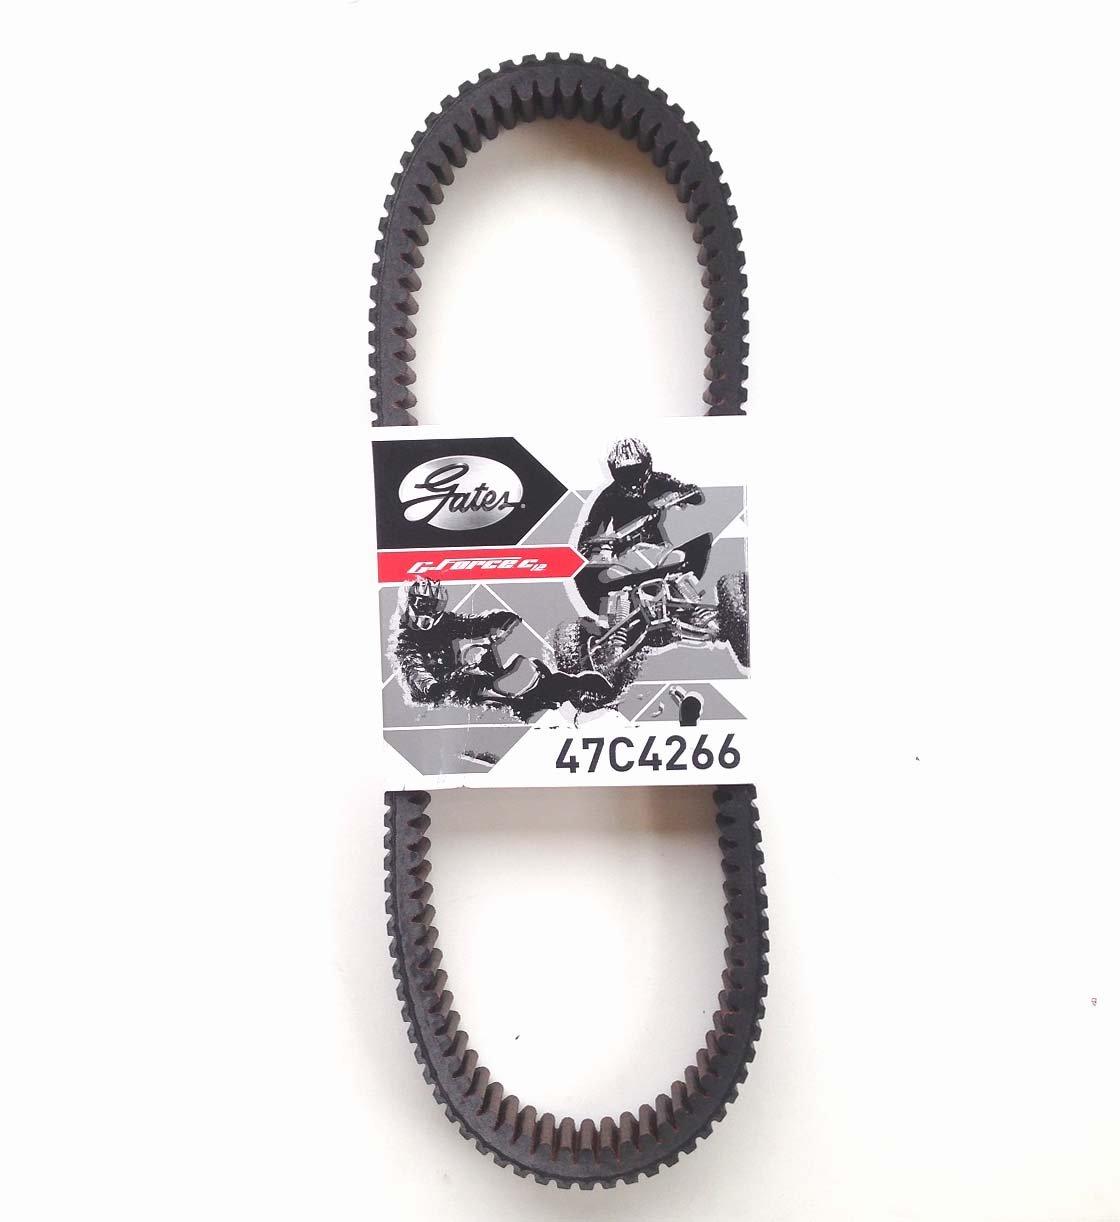 Polaris RZR Turbo Belt 2016 Gates CVT Carbon Cord Drive Belt 47C4266